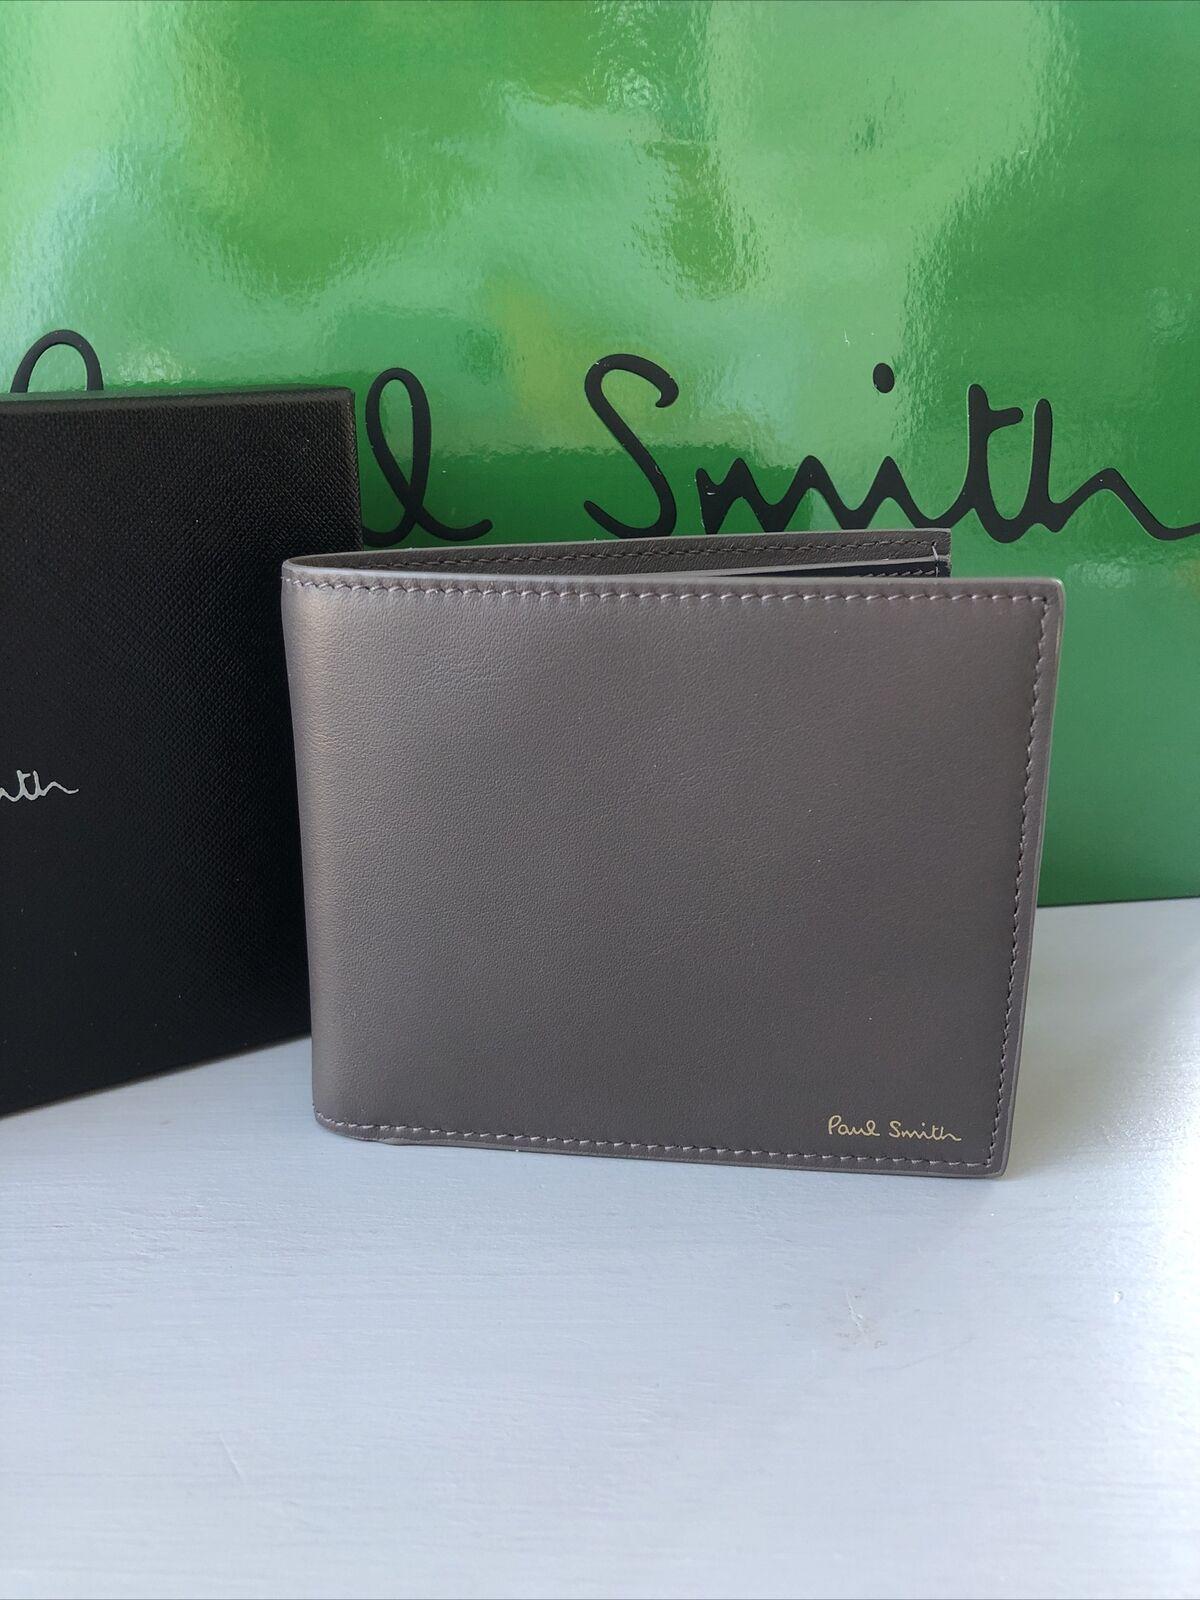 Designer Paul Smith Men Calf Leather Grey/Navy Billfold Wallet BNIB